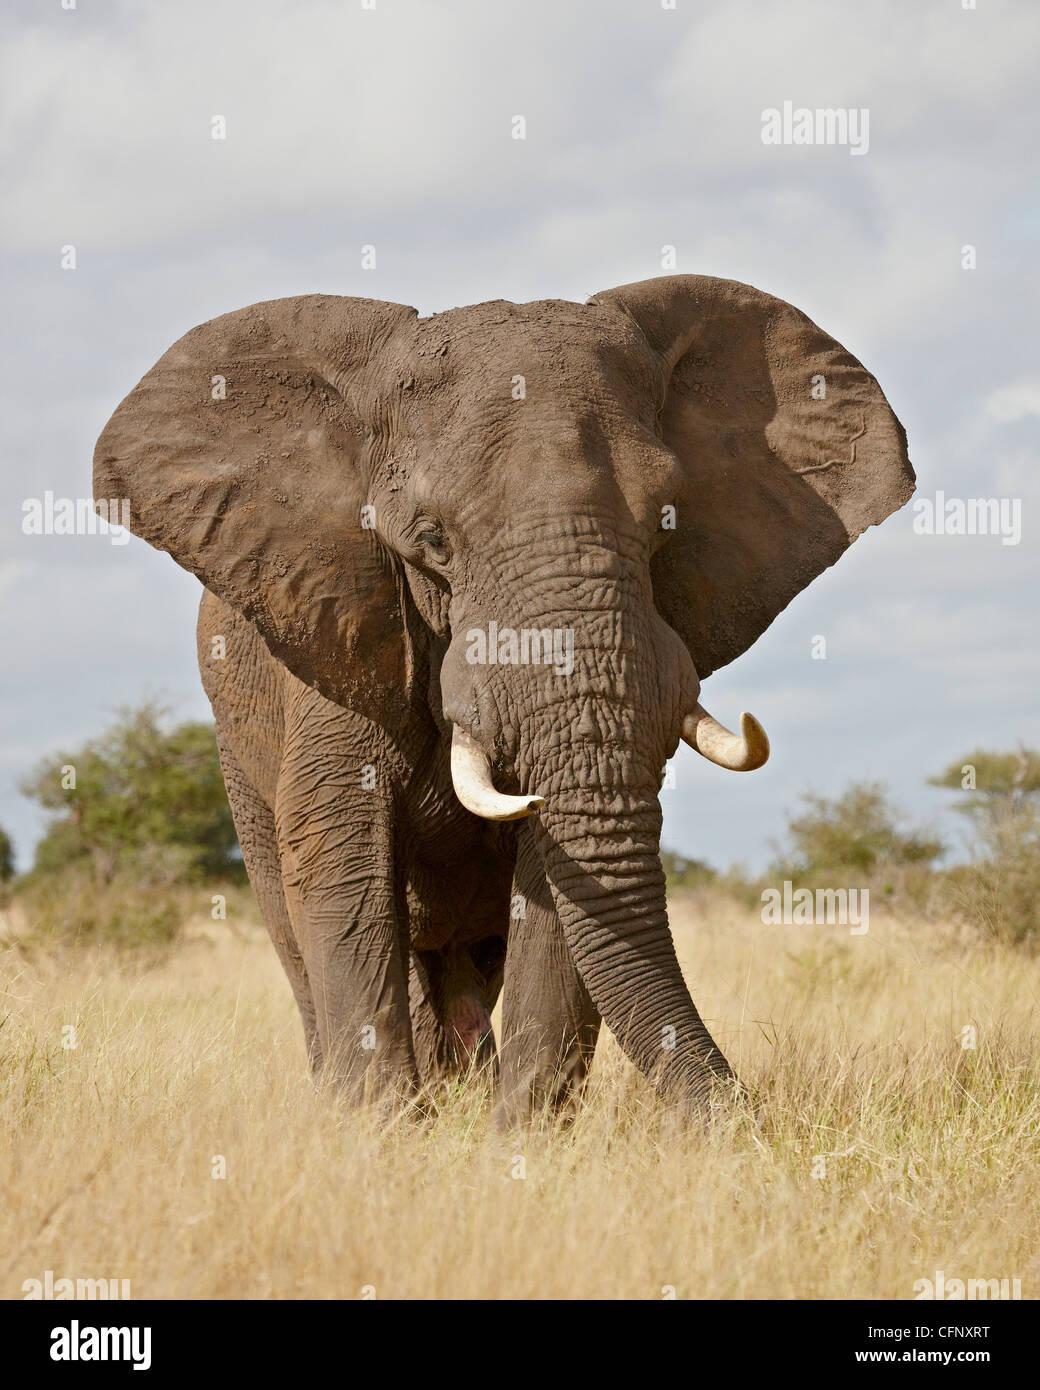 African elephant (Loxodonta africana), Kruger National Park, South Africa, Africa - Stock Image